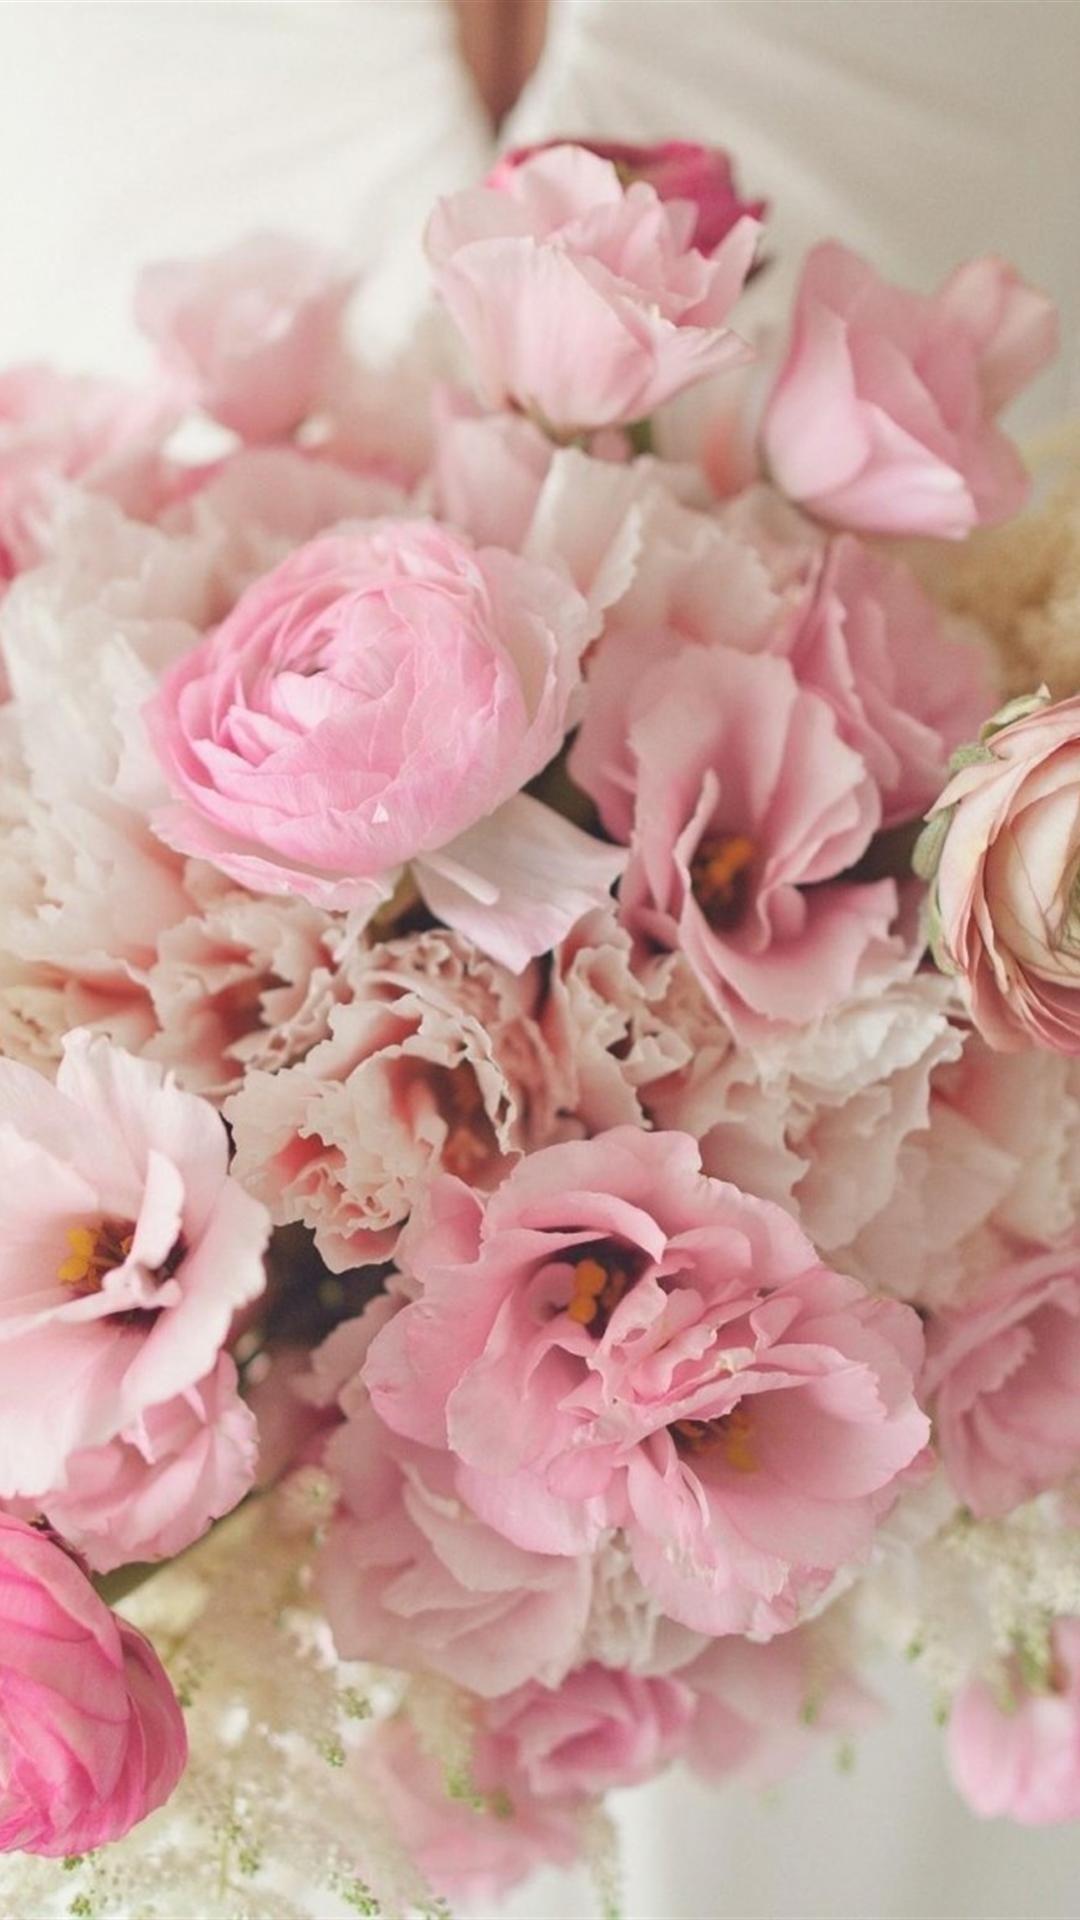 Цветы обои на айфон 6